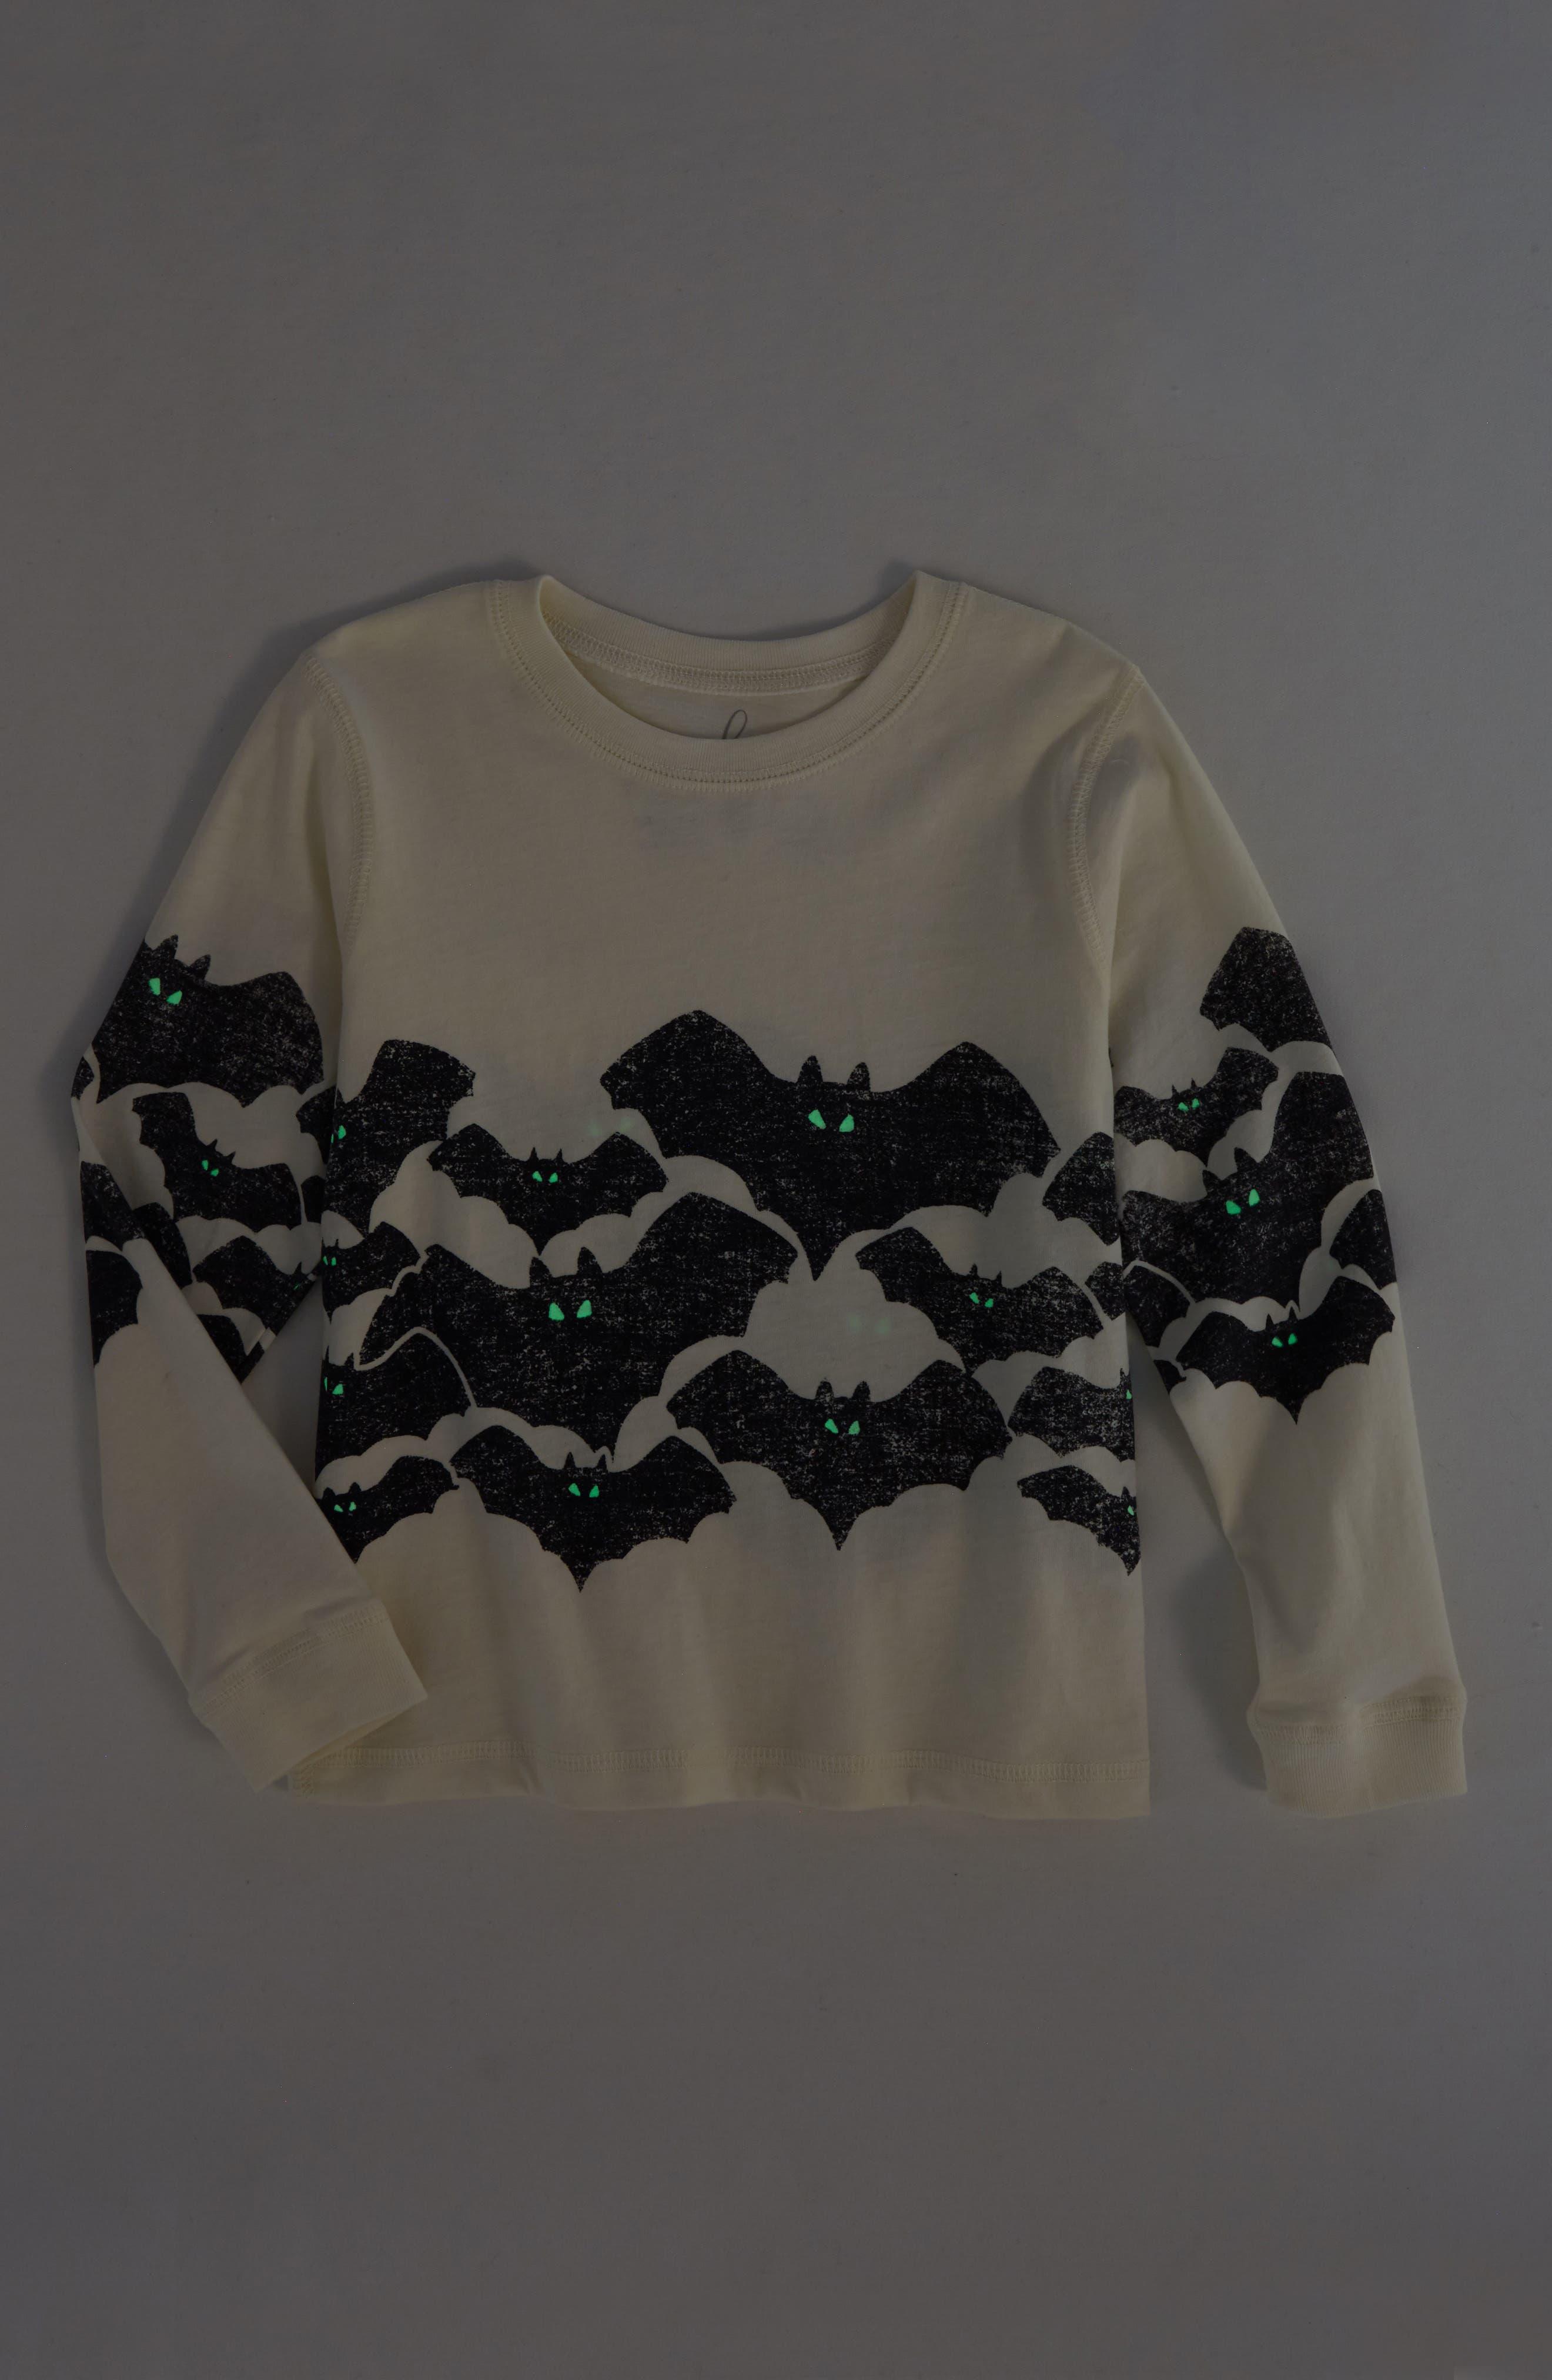 Bats Glow in the Dark T-Shirt,                             Alternate thumbnail 2, color,                             900